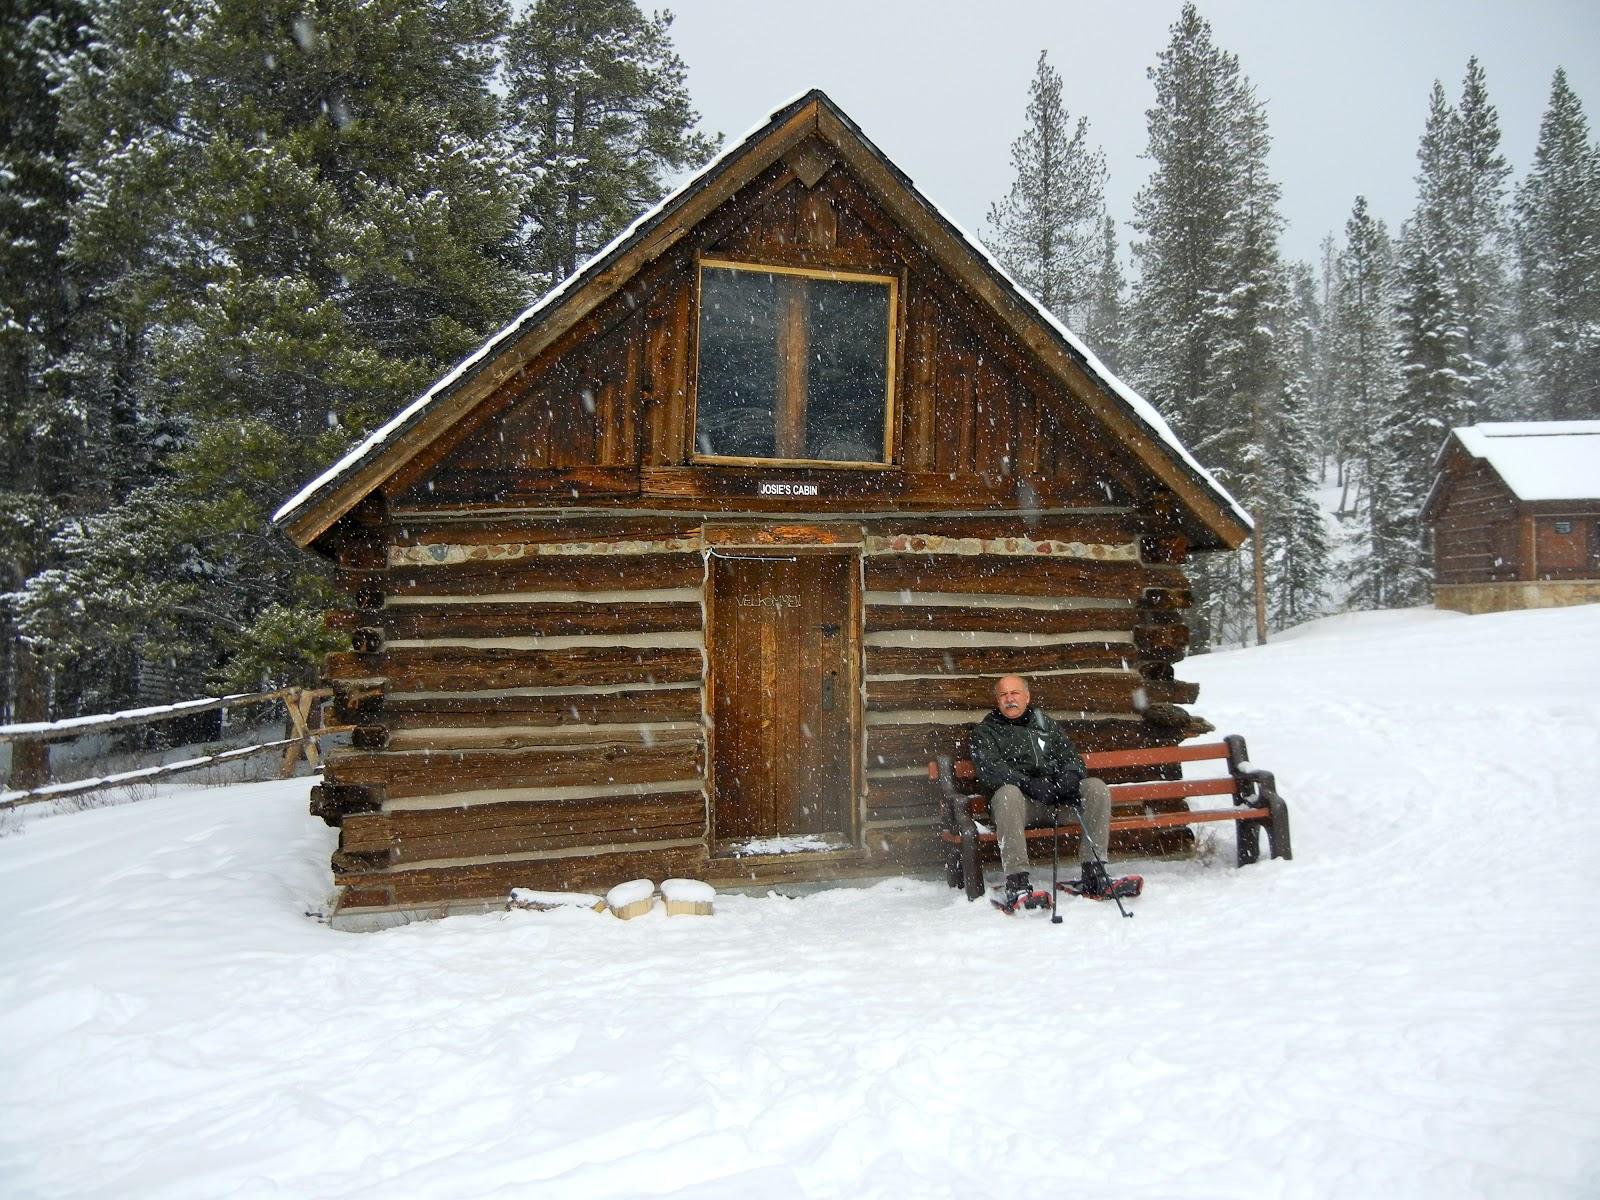 Cabin Creek Clothing: A Curious Gardener: Rocky Mountain Love